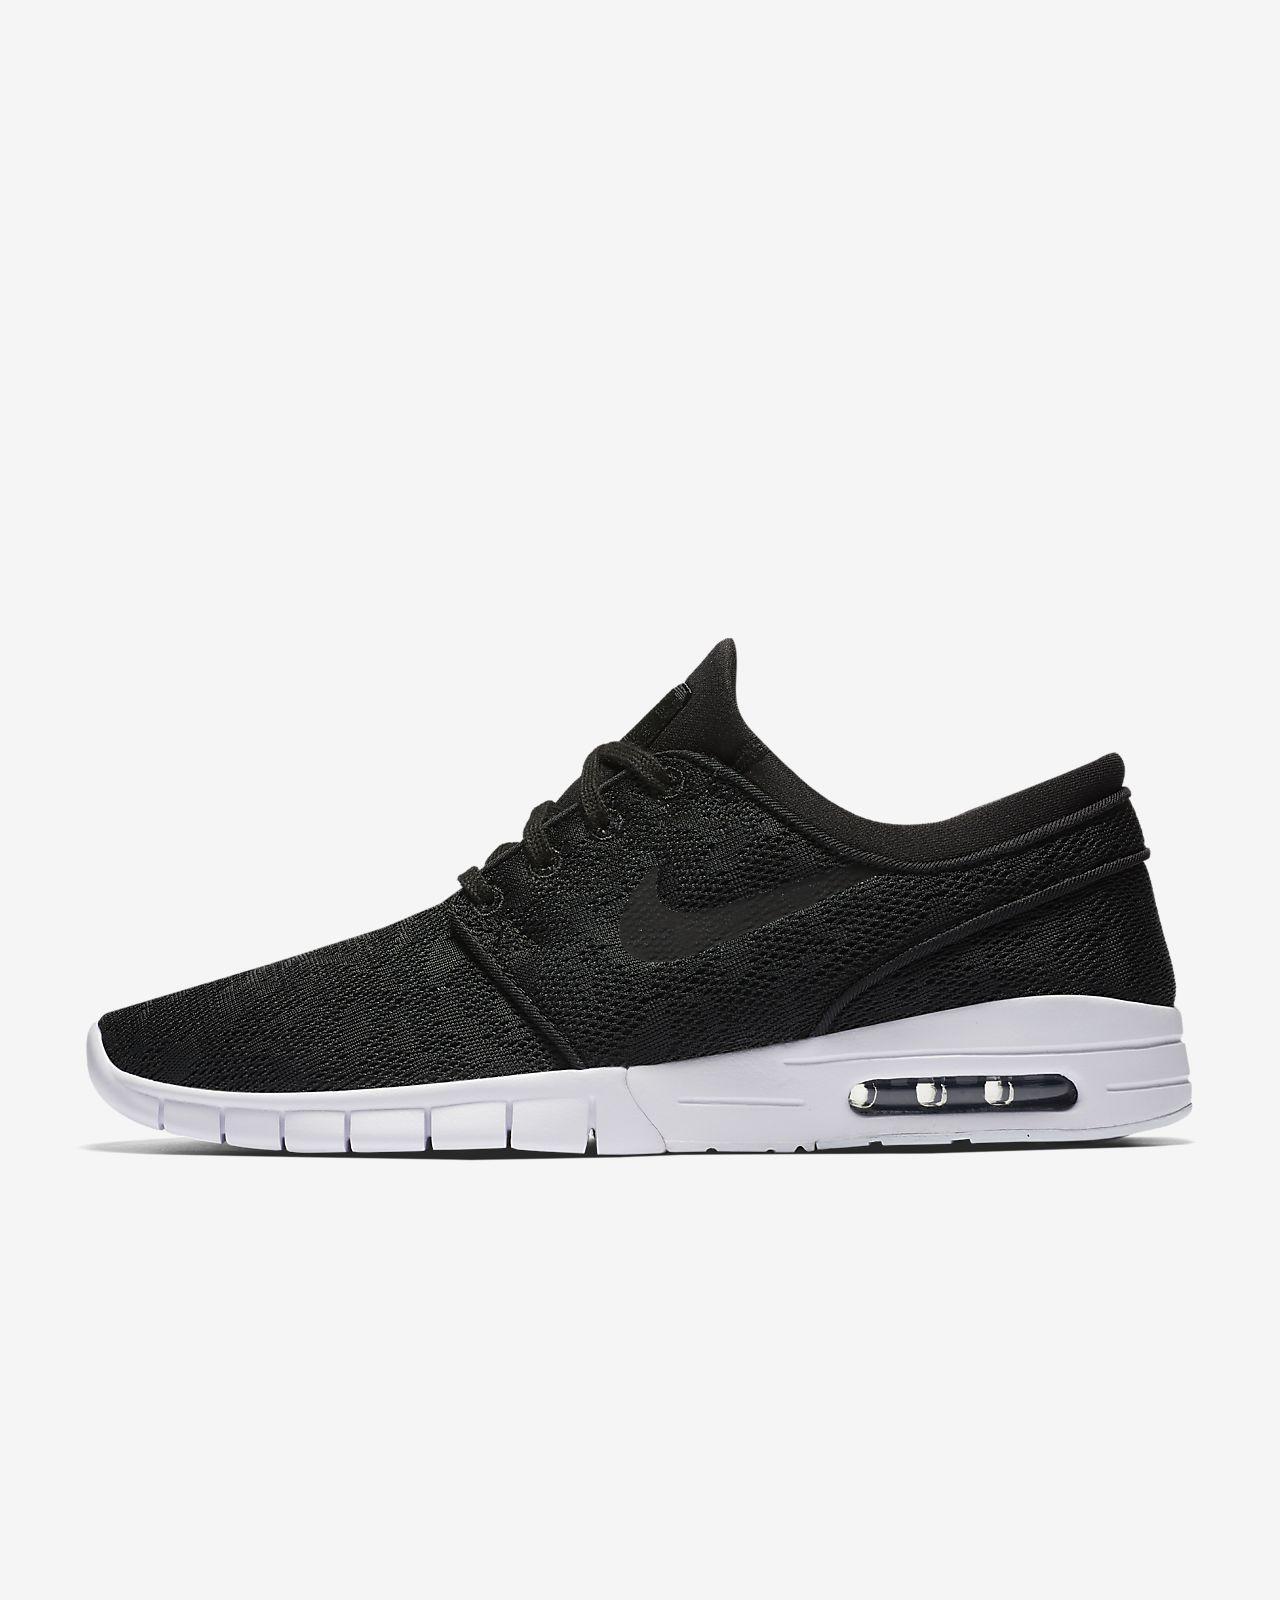 1b4695fe8a2cf Nike SB Stefan Janoski Max Skate Shoe. Nike.com AU